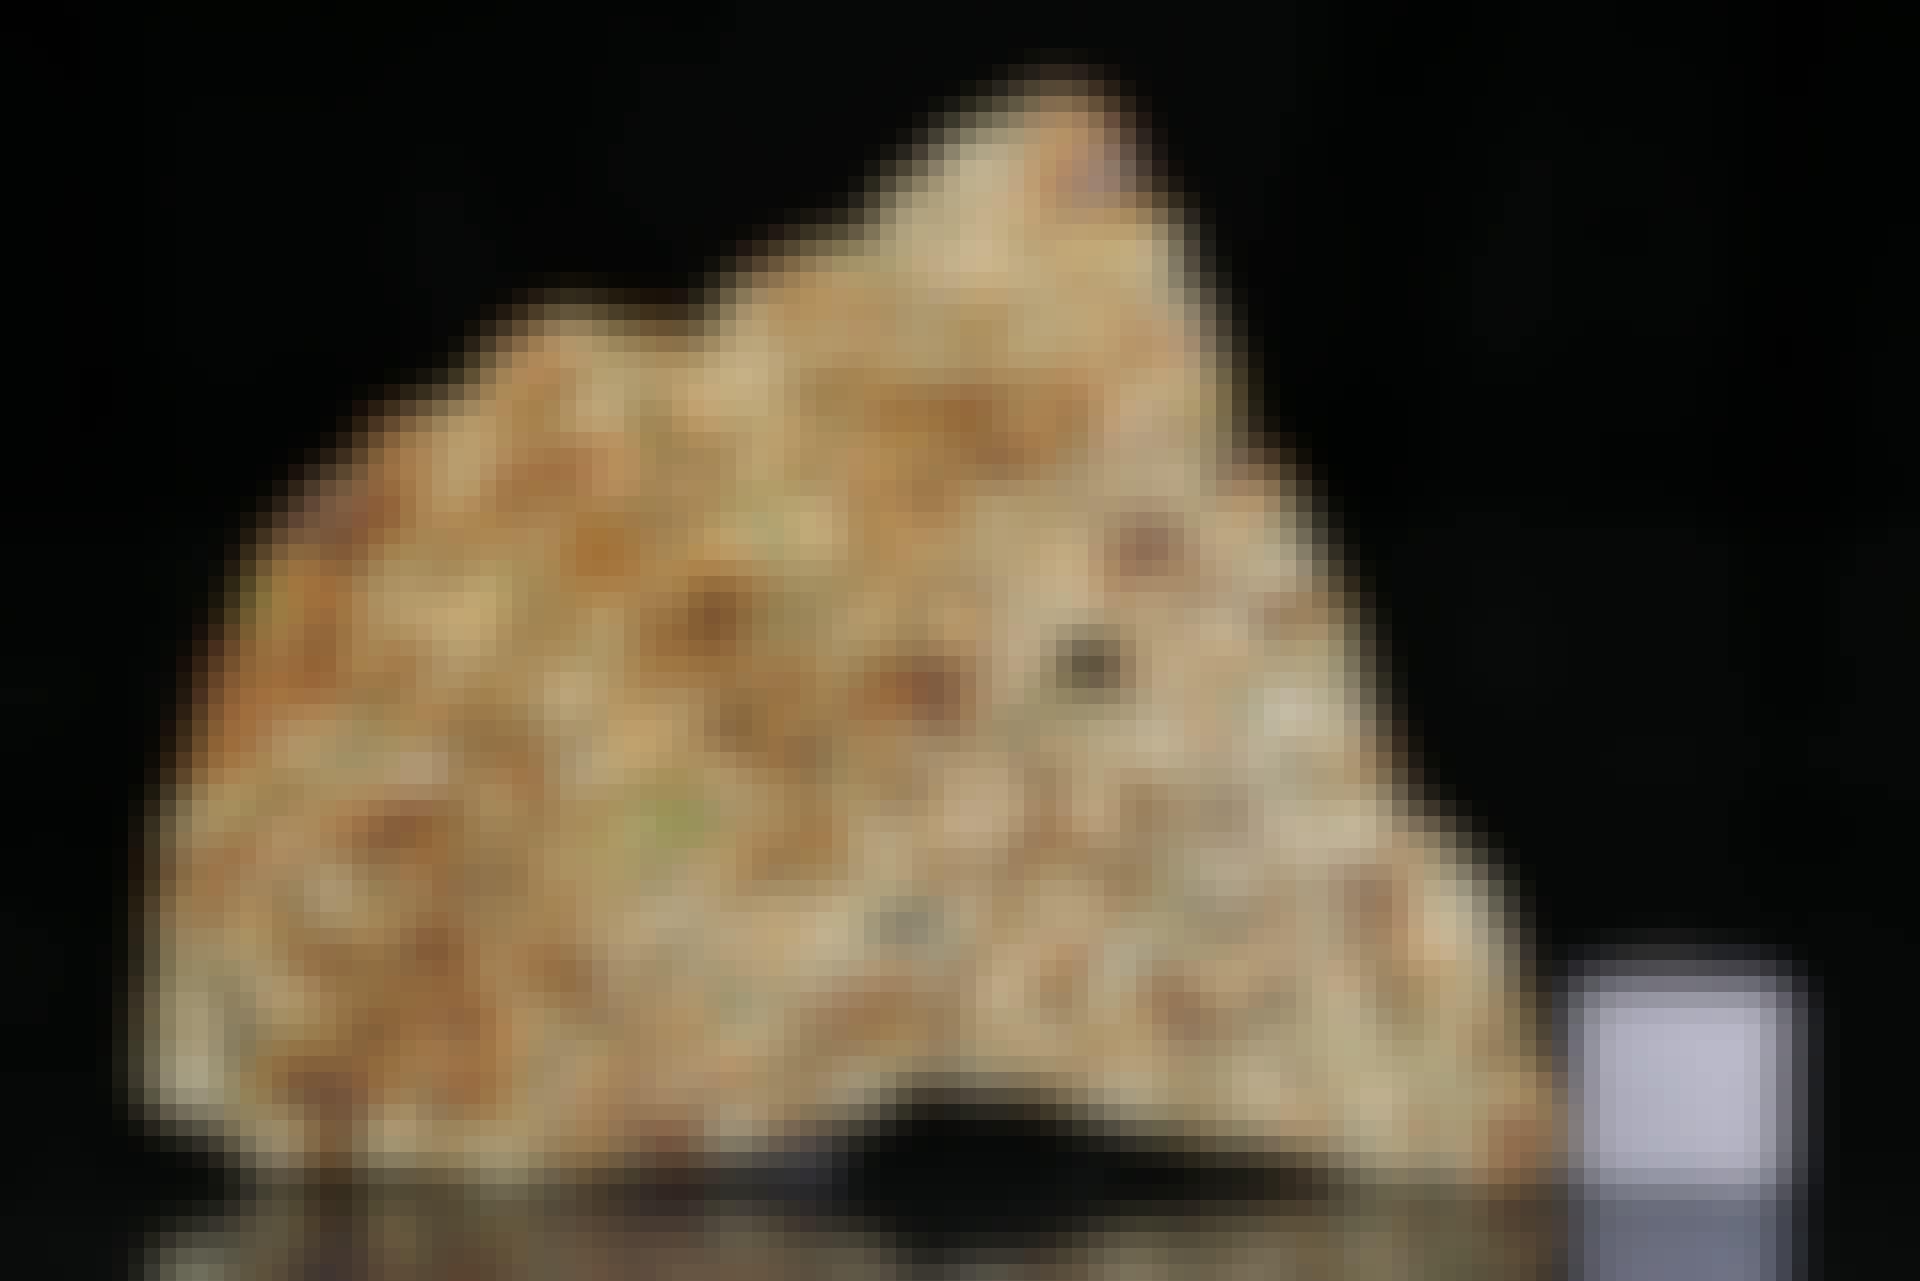 erg chech 002, meteorit, ældste, sten, rekord, sahara, algeriet